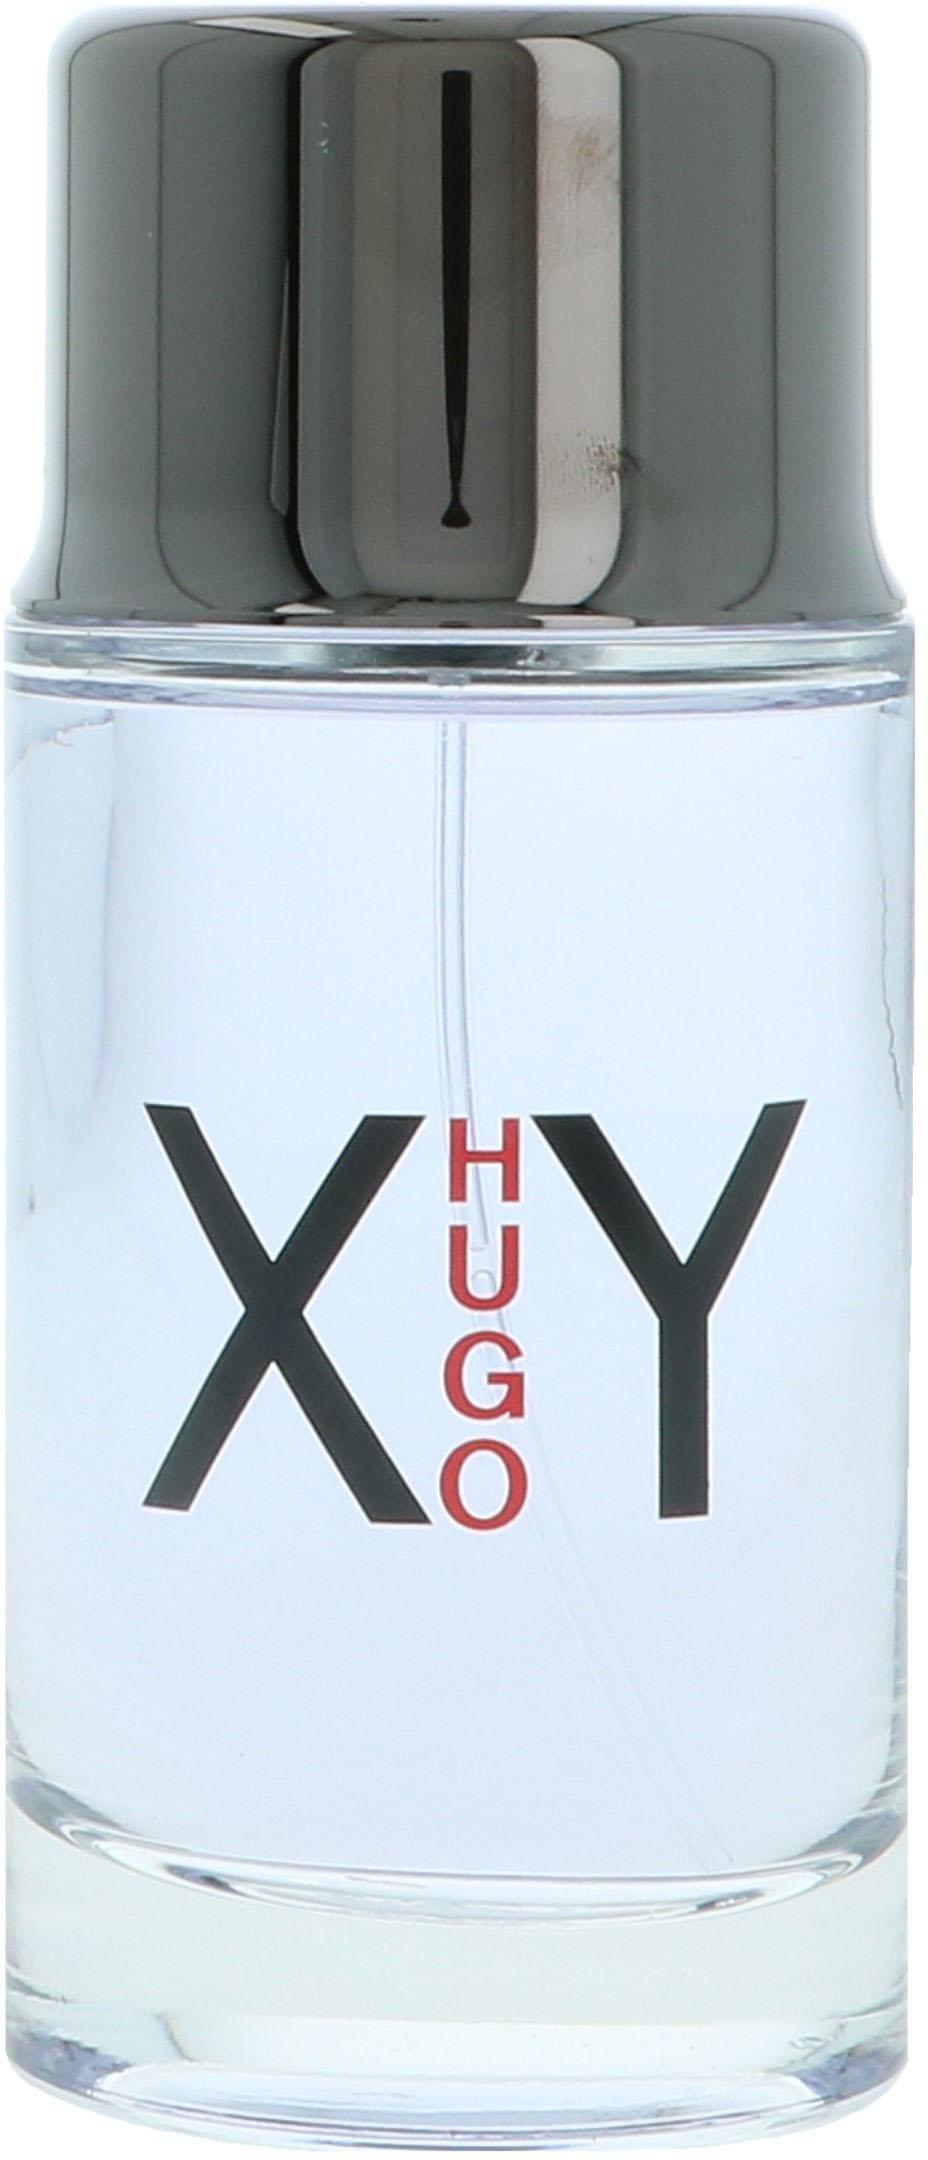 »Hugo XY«, Eau de Toilette